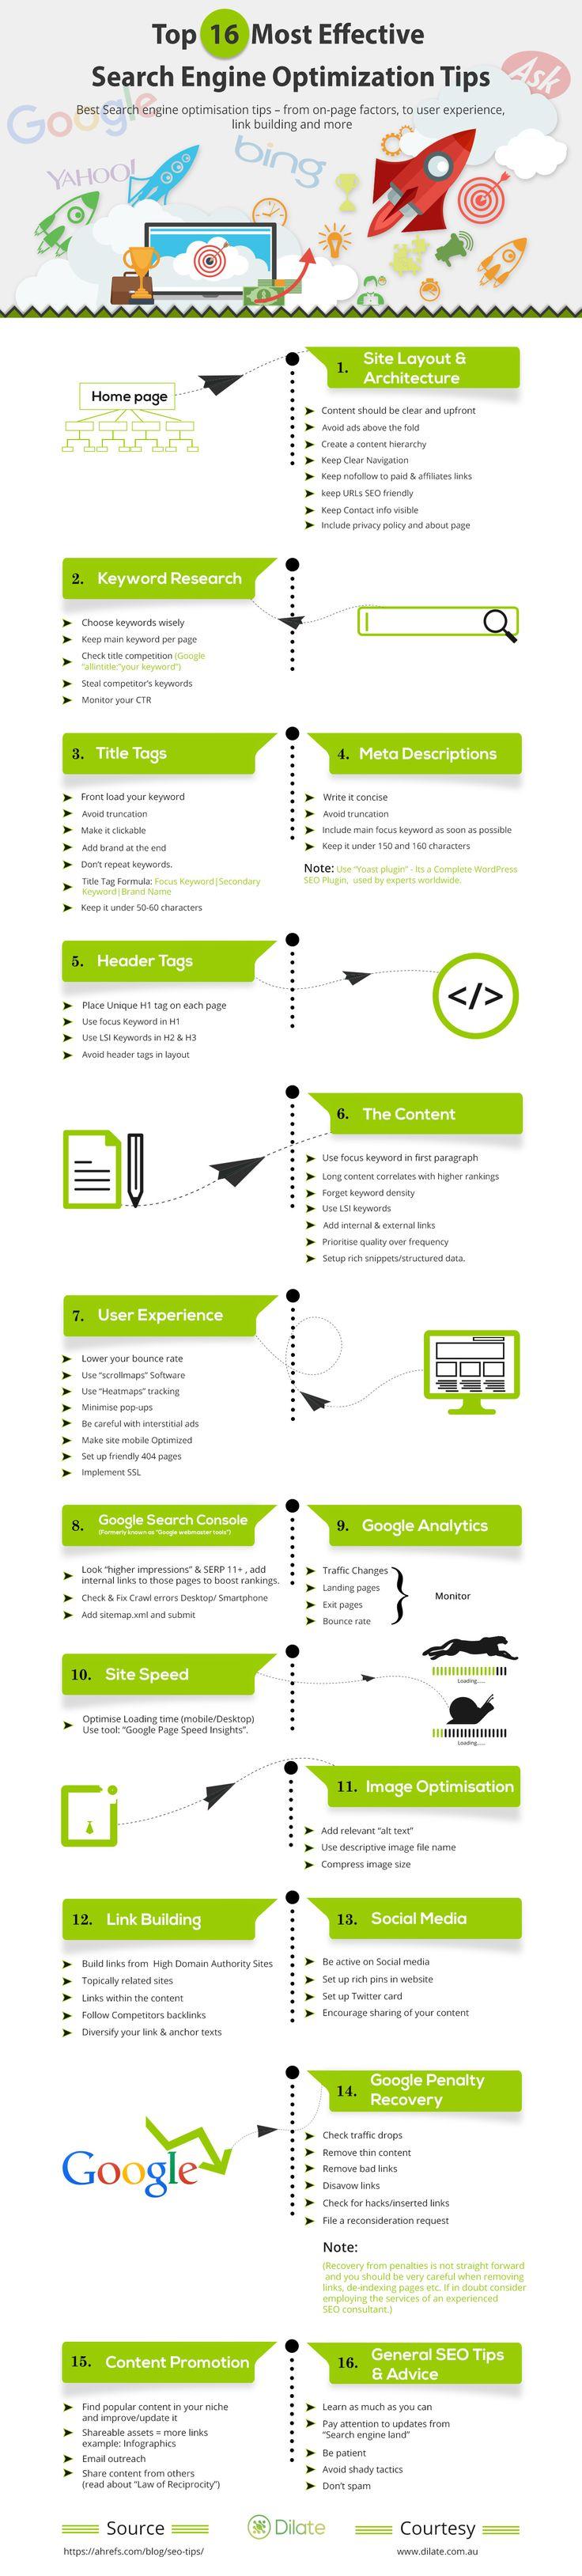 SEO Basics: 16 Essentials When Optimizing Your Site - #infographic #SEO @rubendelaosa http://www.rubendelaosa.com/